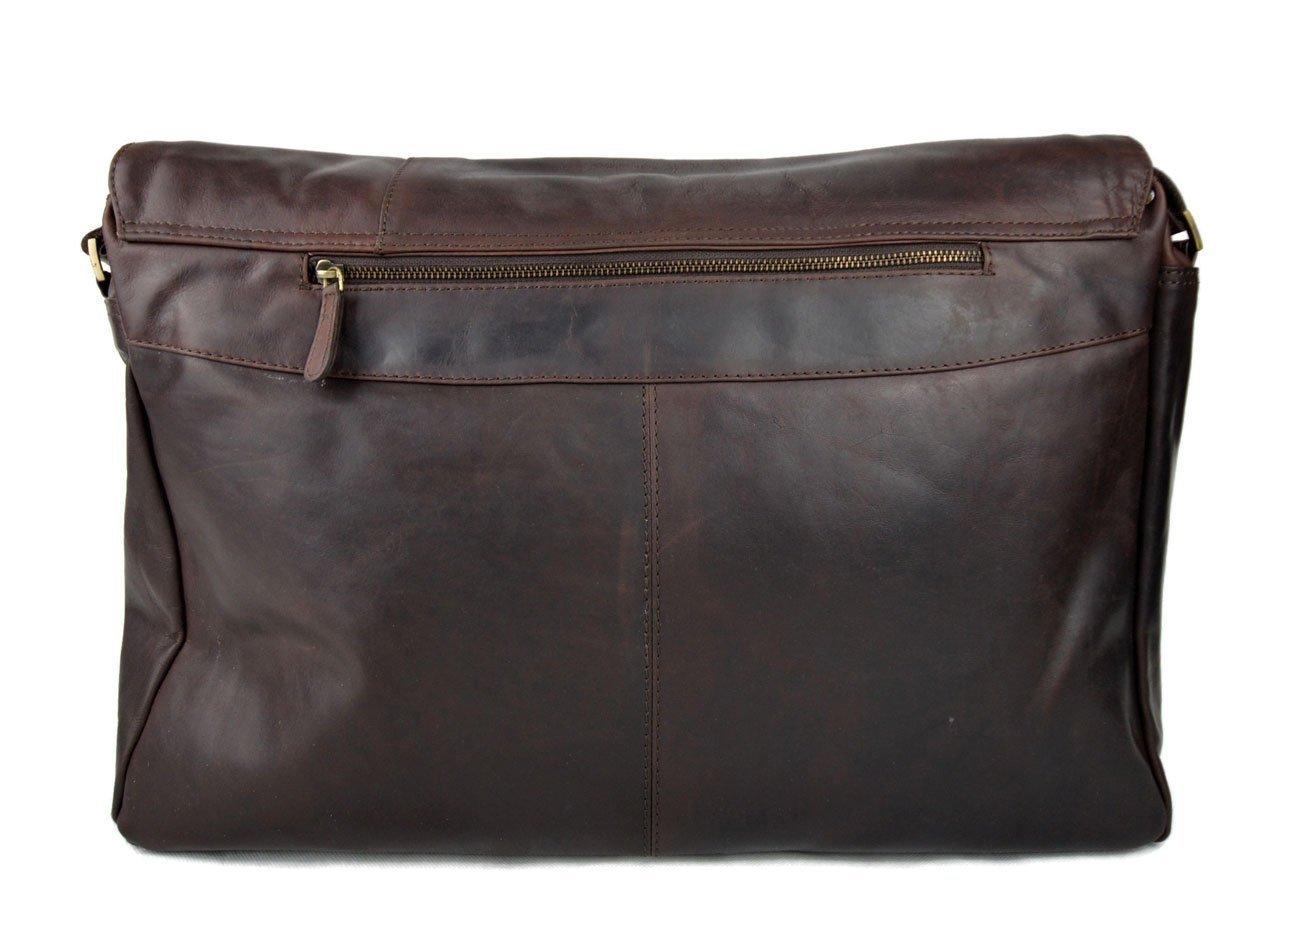 fc0ea0c904 Genuine italian leather XXL shoulder messenger bag ipad laptop ladies men  notebook leatherbag satchel dark brown crossbody business executive bag  ...